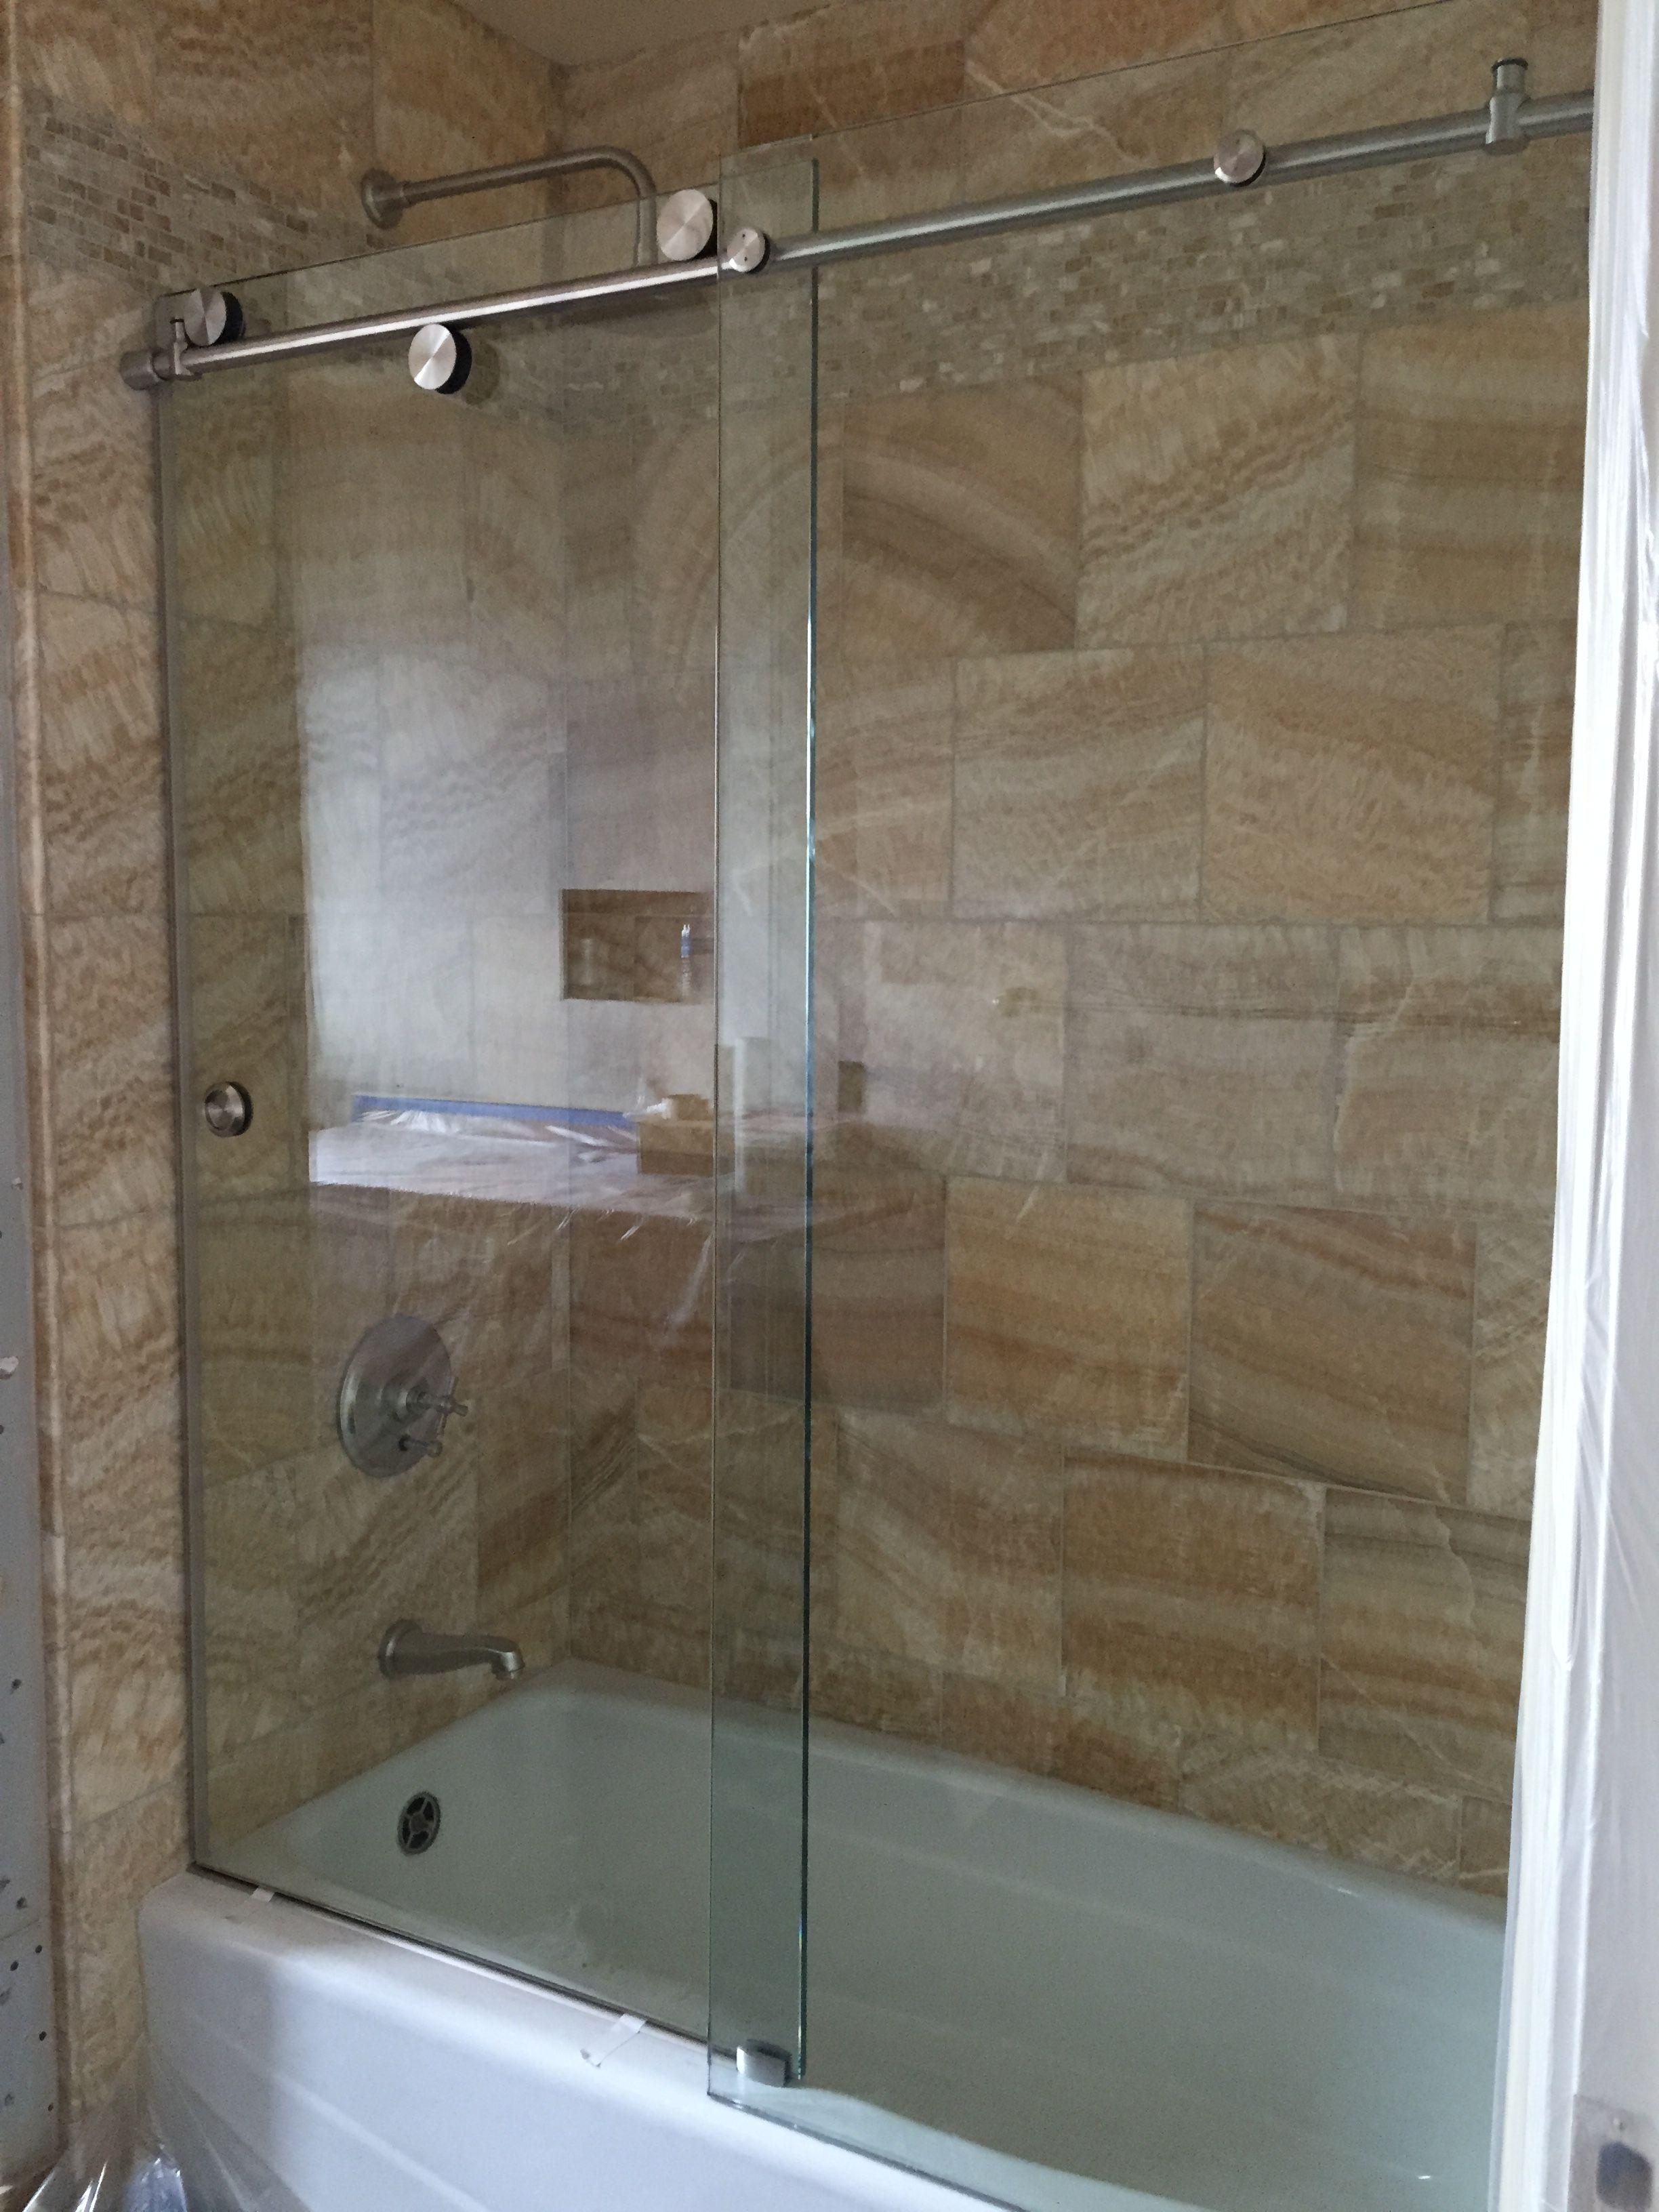 Skyline Series Frameless Glass Shower Enclosure 3 8 Clear